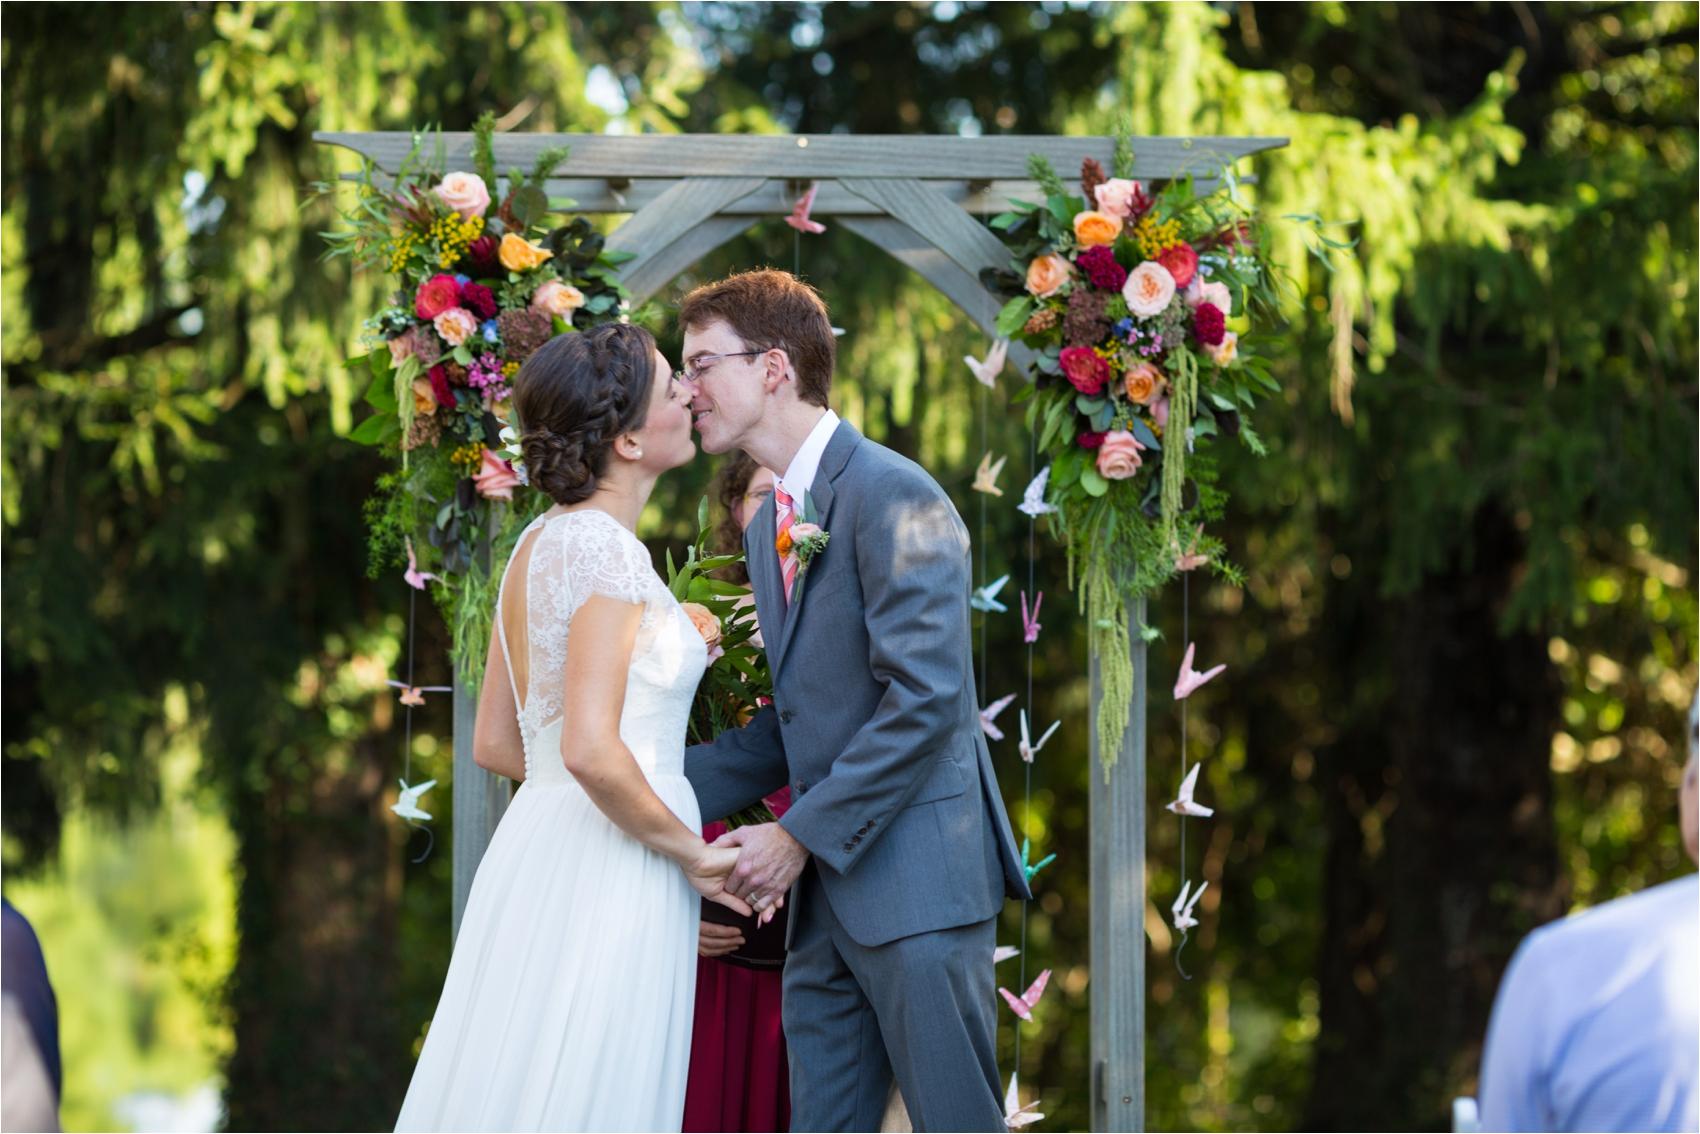 Feather-and-Oak-Rainforest-Trust-Virginia-Wedding-2692.jpg